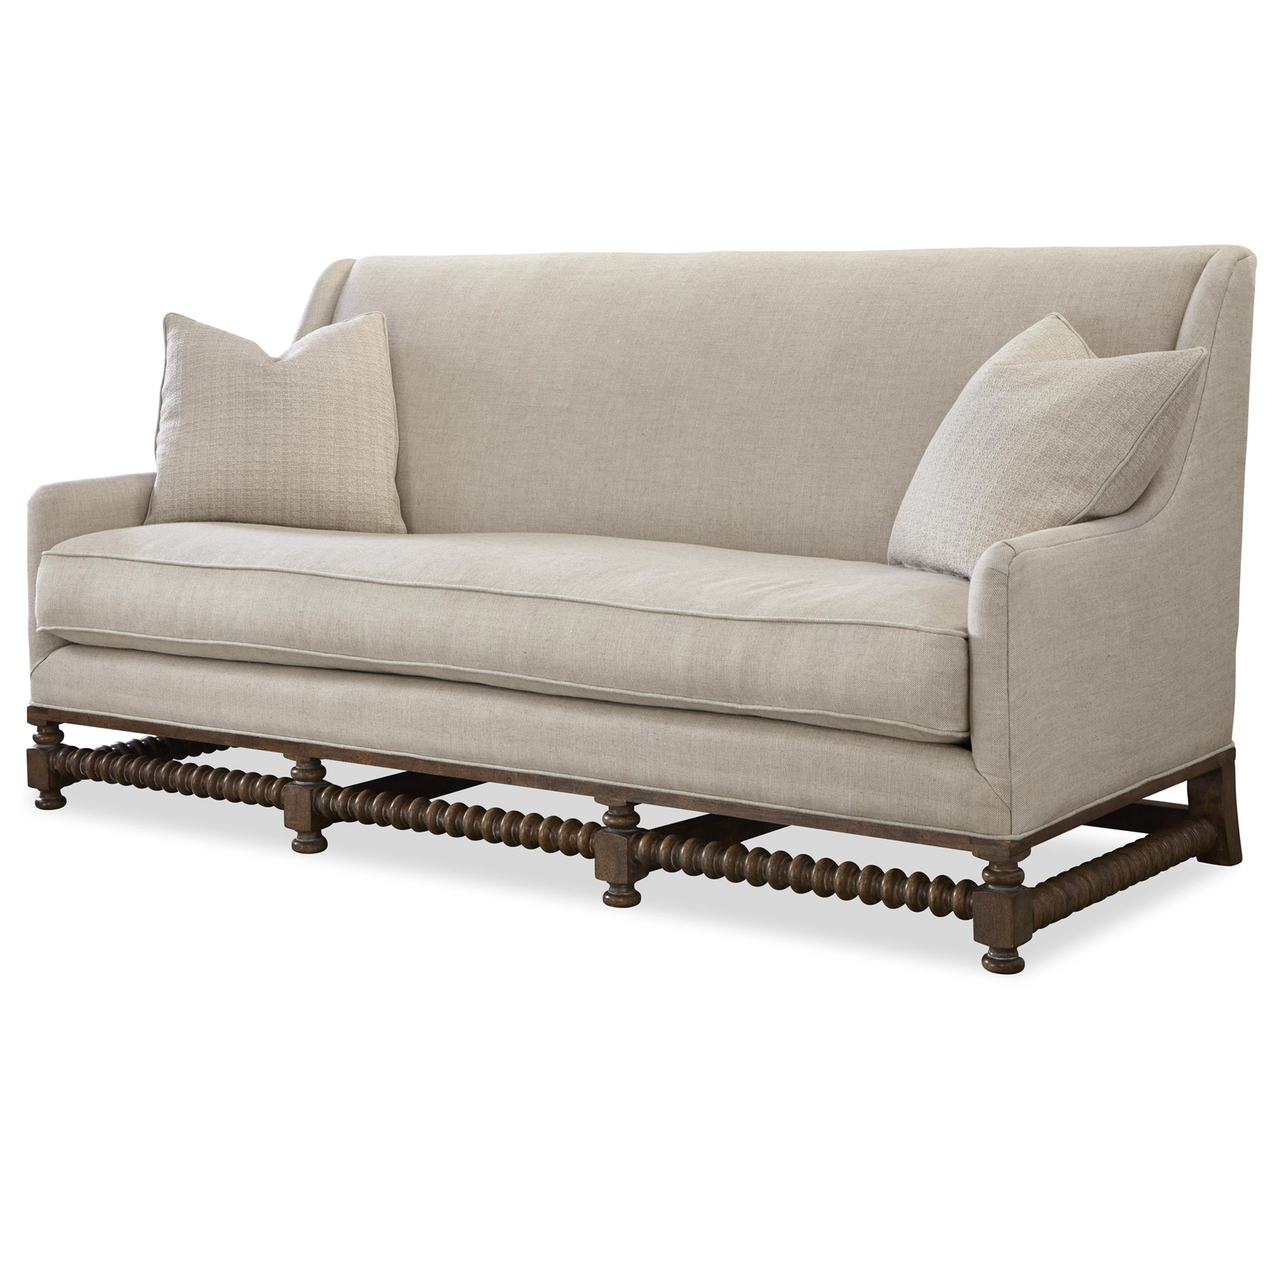 Fabulous Sundance Bohemian Linen Upholstered Sofa Settee Gamerscity Chair Design For Home Gamerscityorg